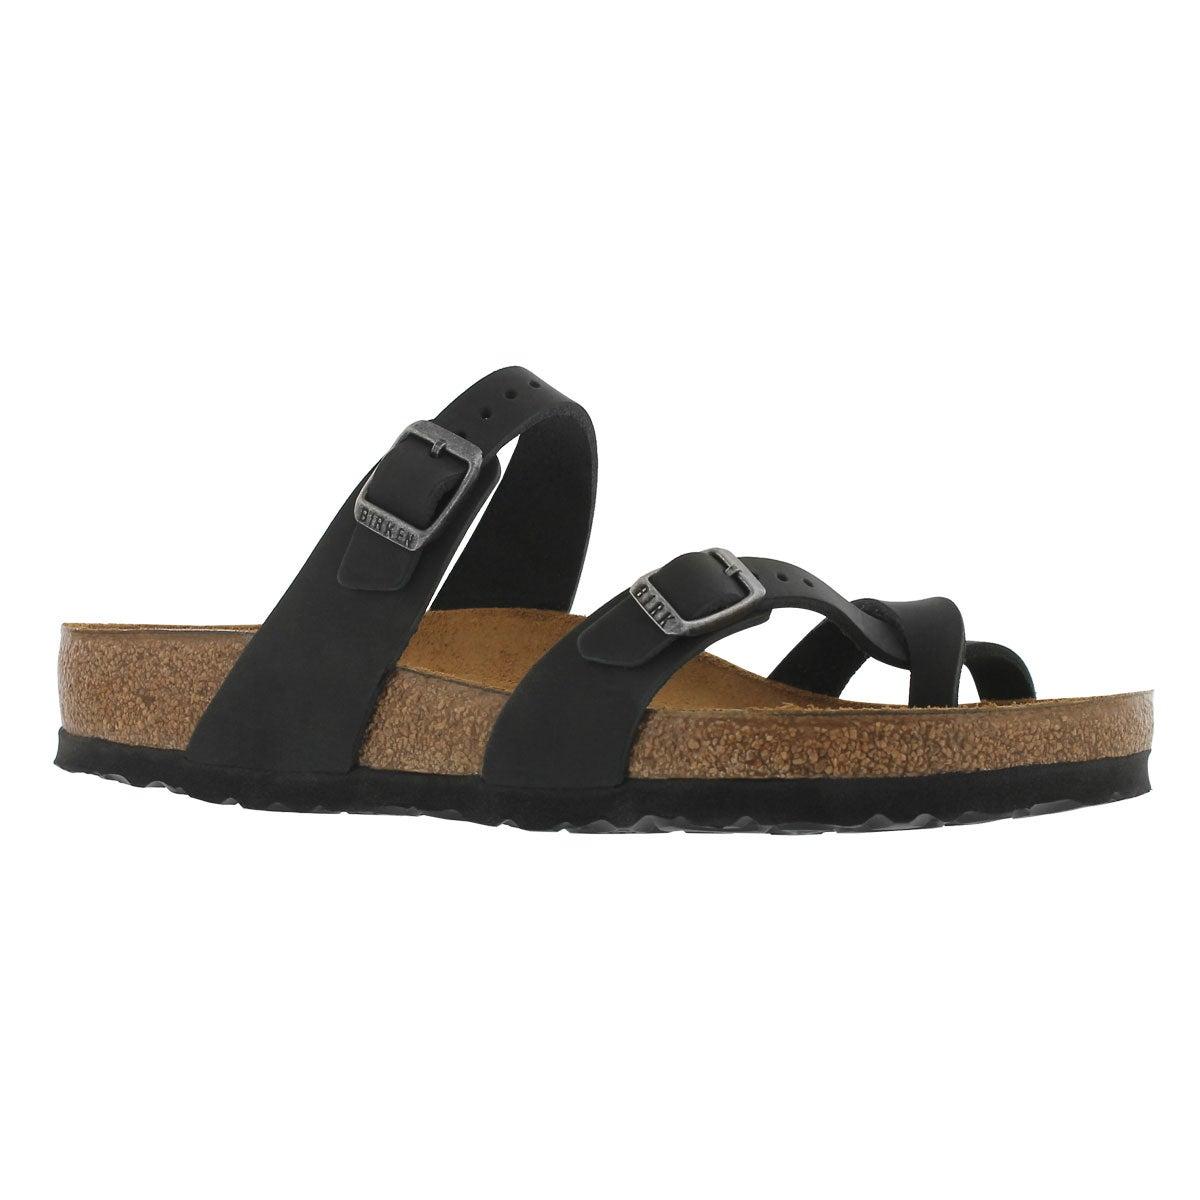 Women's MAYARI OLTR black thong sandals